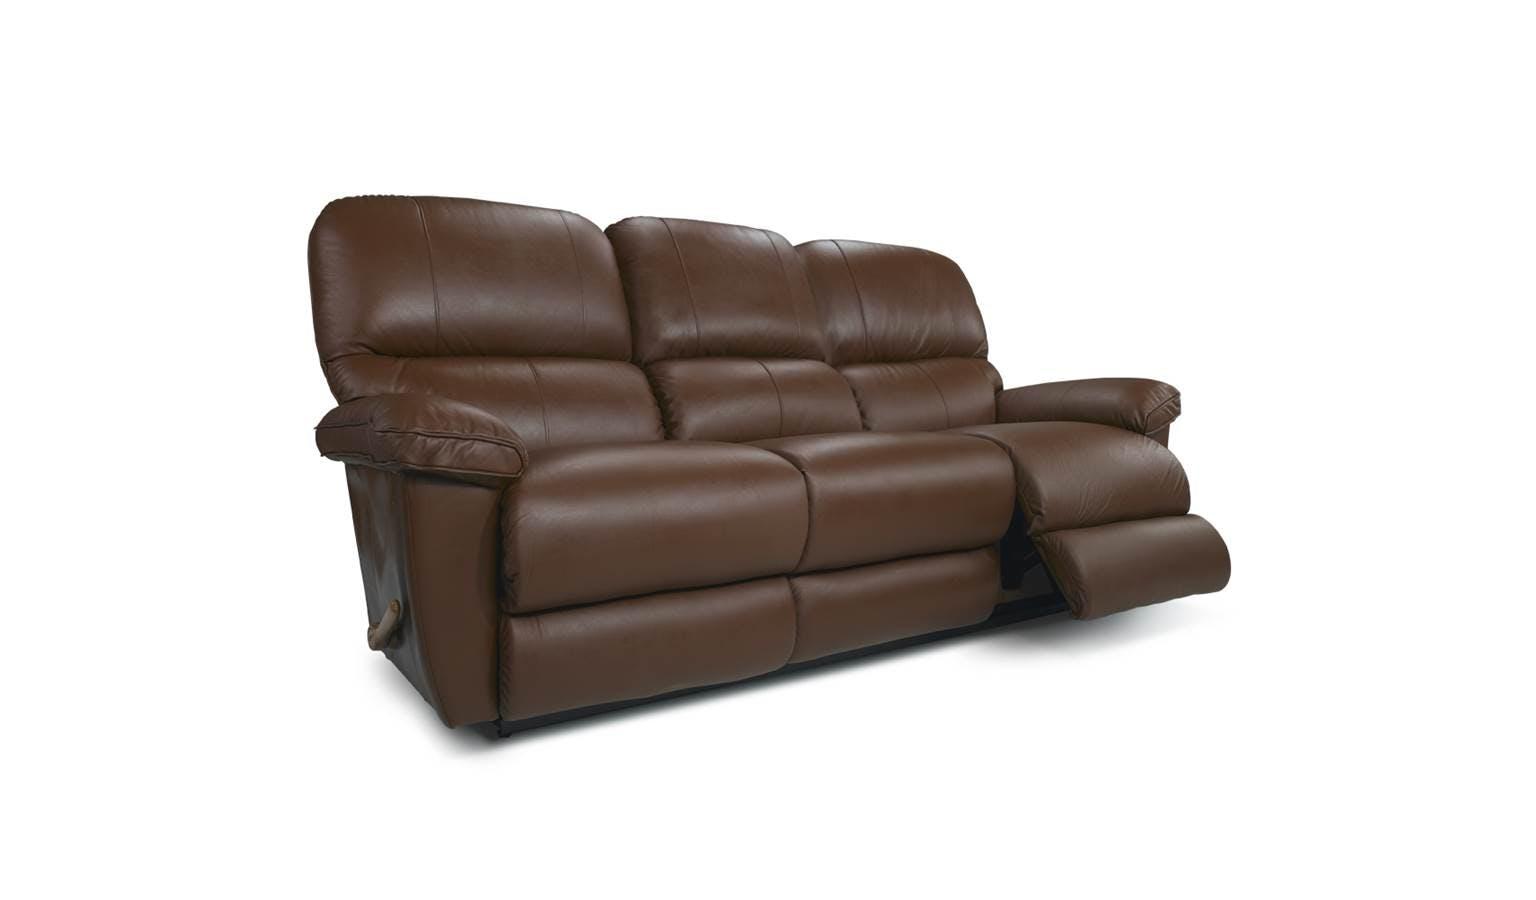 Superb La Z Boy Clarkston 3 Seater Wall Reclining Sofa Machost Co Dining Chair Design Ideas Machostcouk